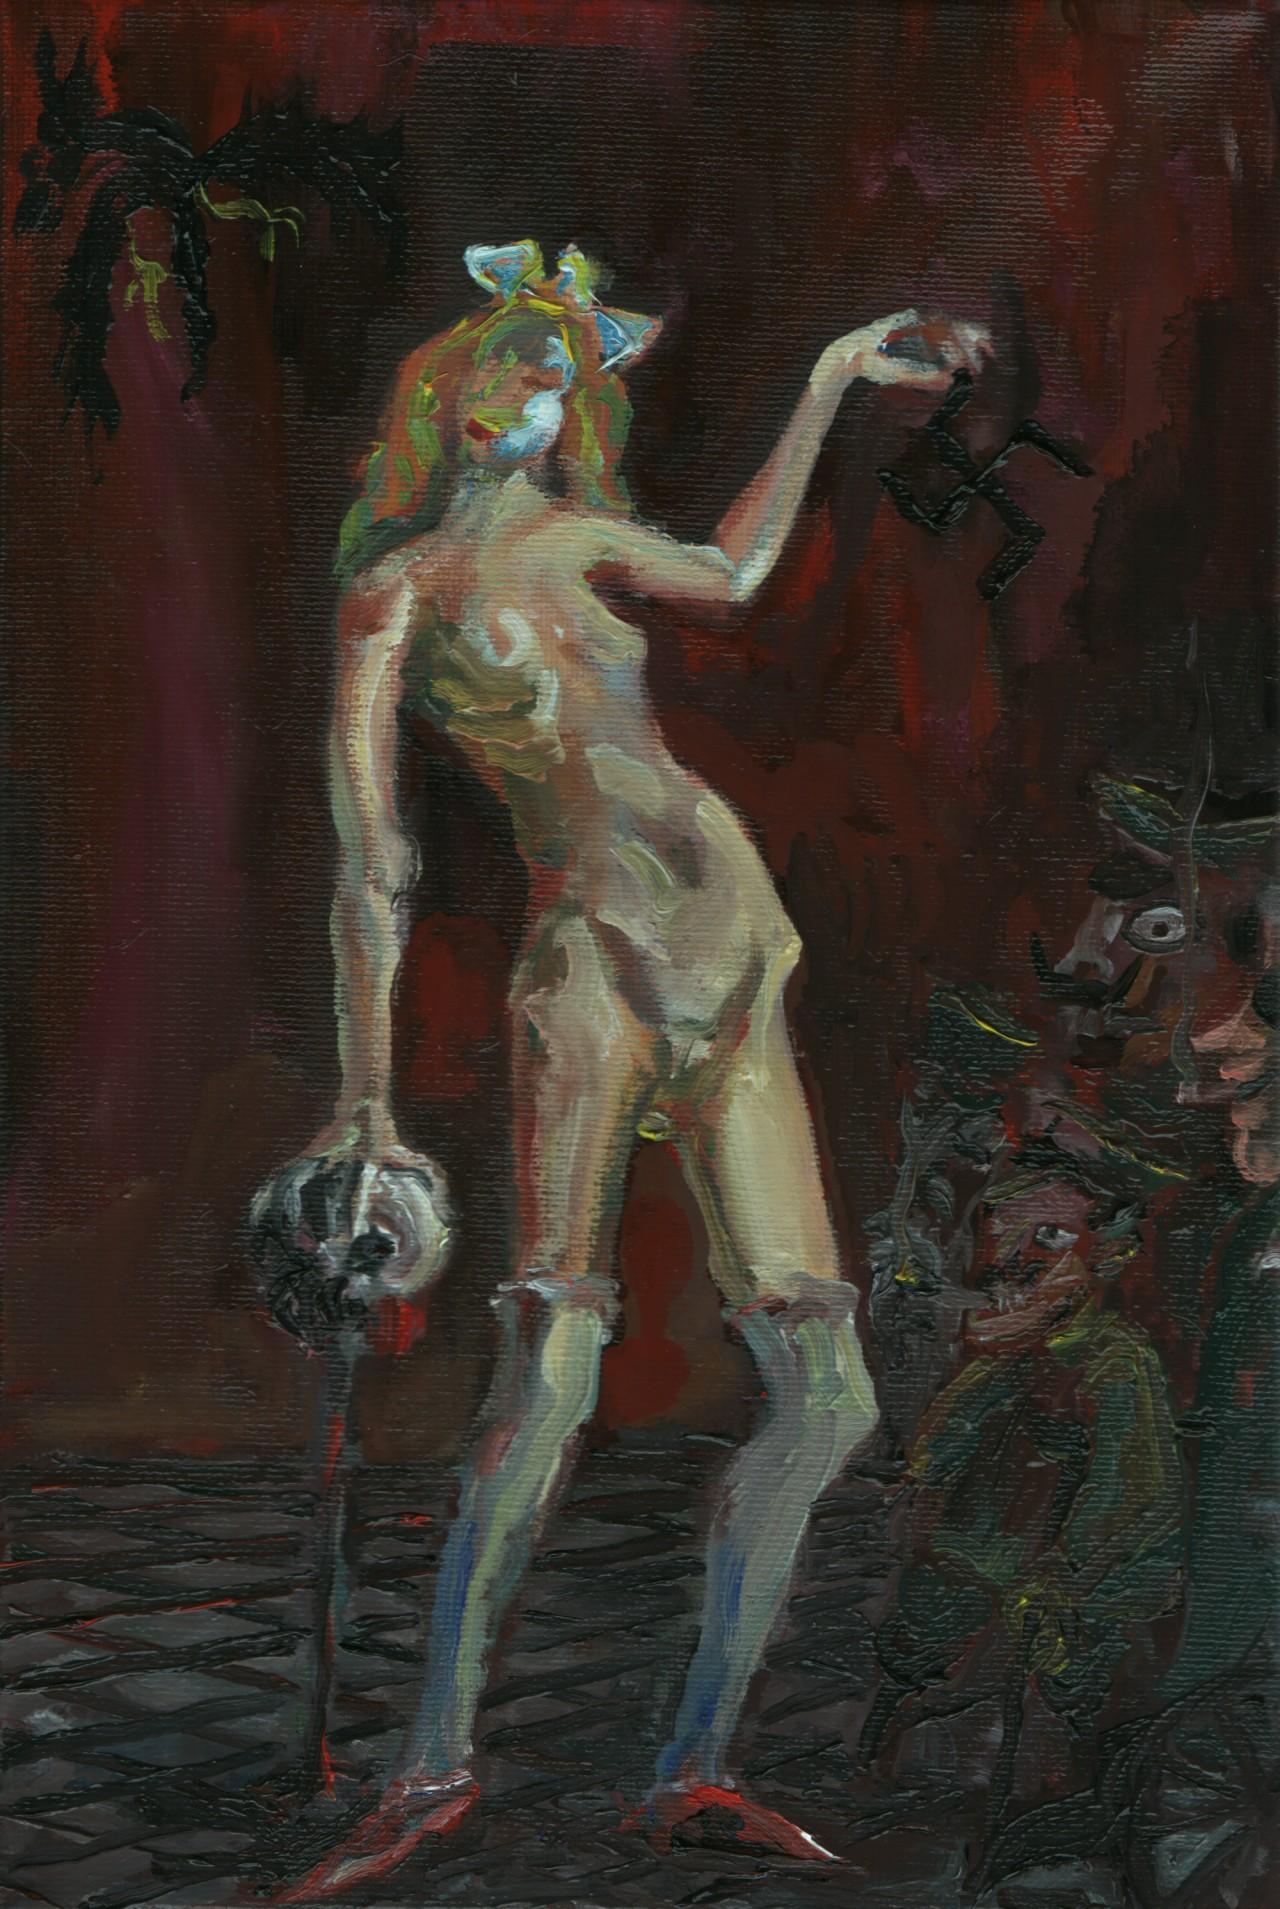 Degenerate Dixtortion 7 - Cerezo Montilla - compar cuadros modernos, comprar cuadros, cuadros modernos